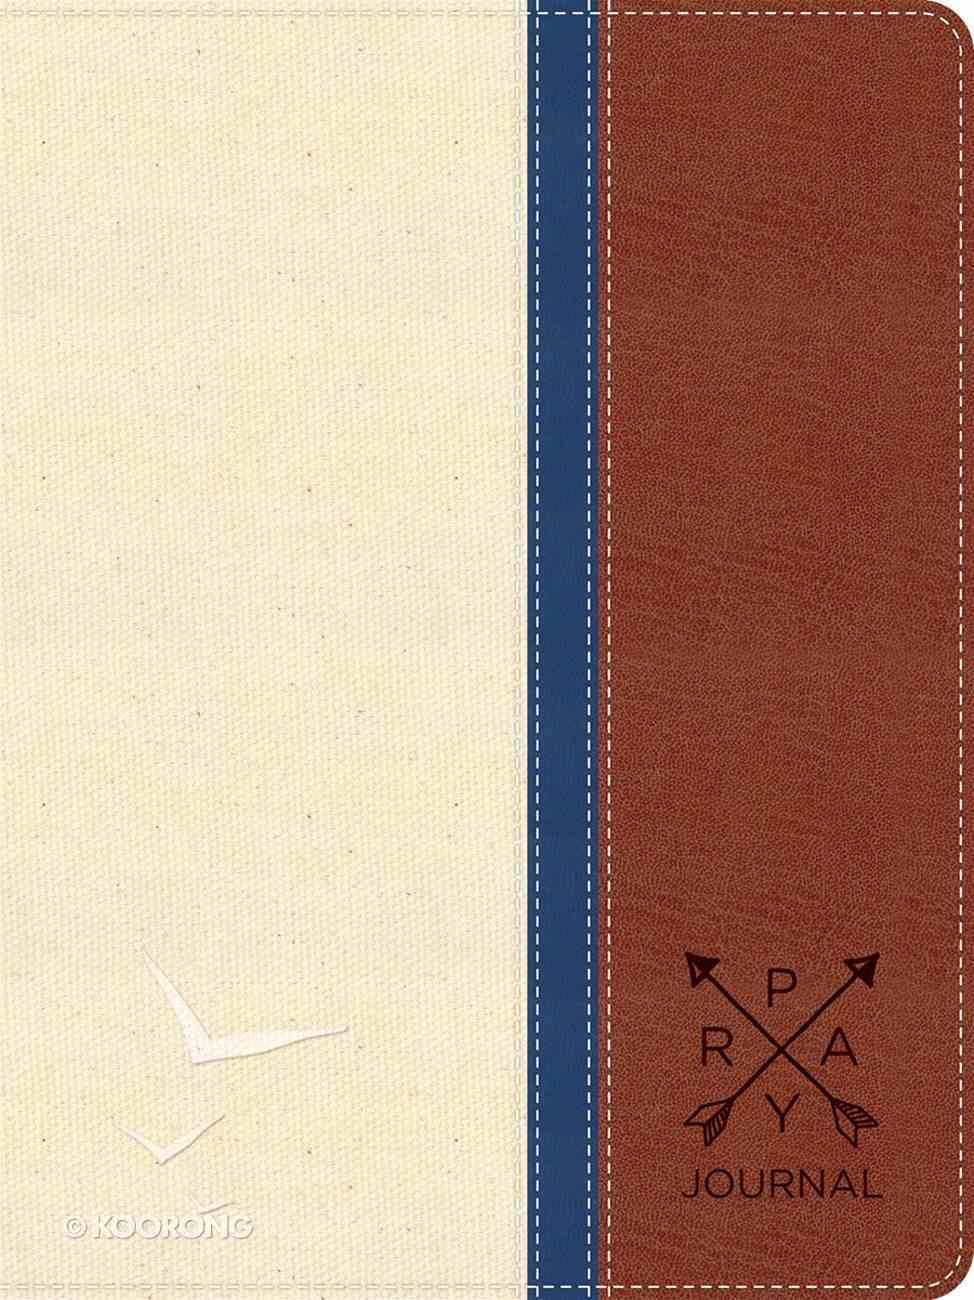 Leatherluxe Journal: Prayer Warrior Imitation Leather